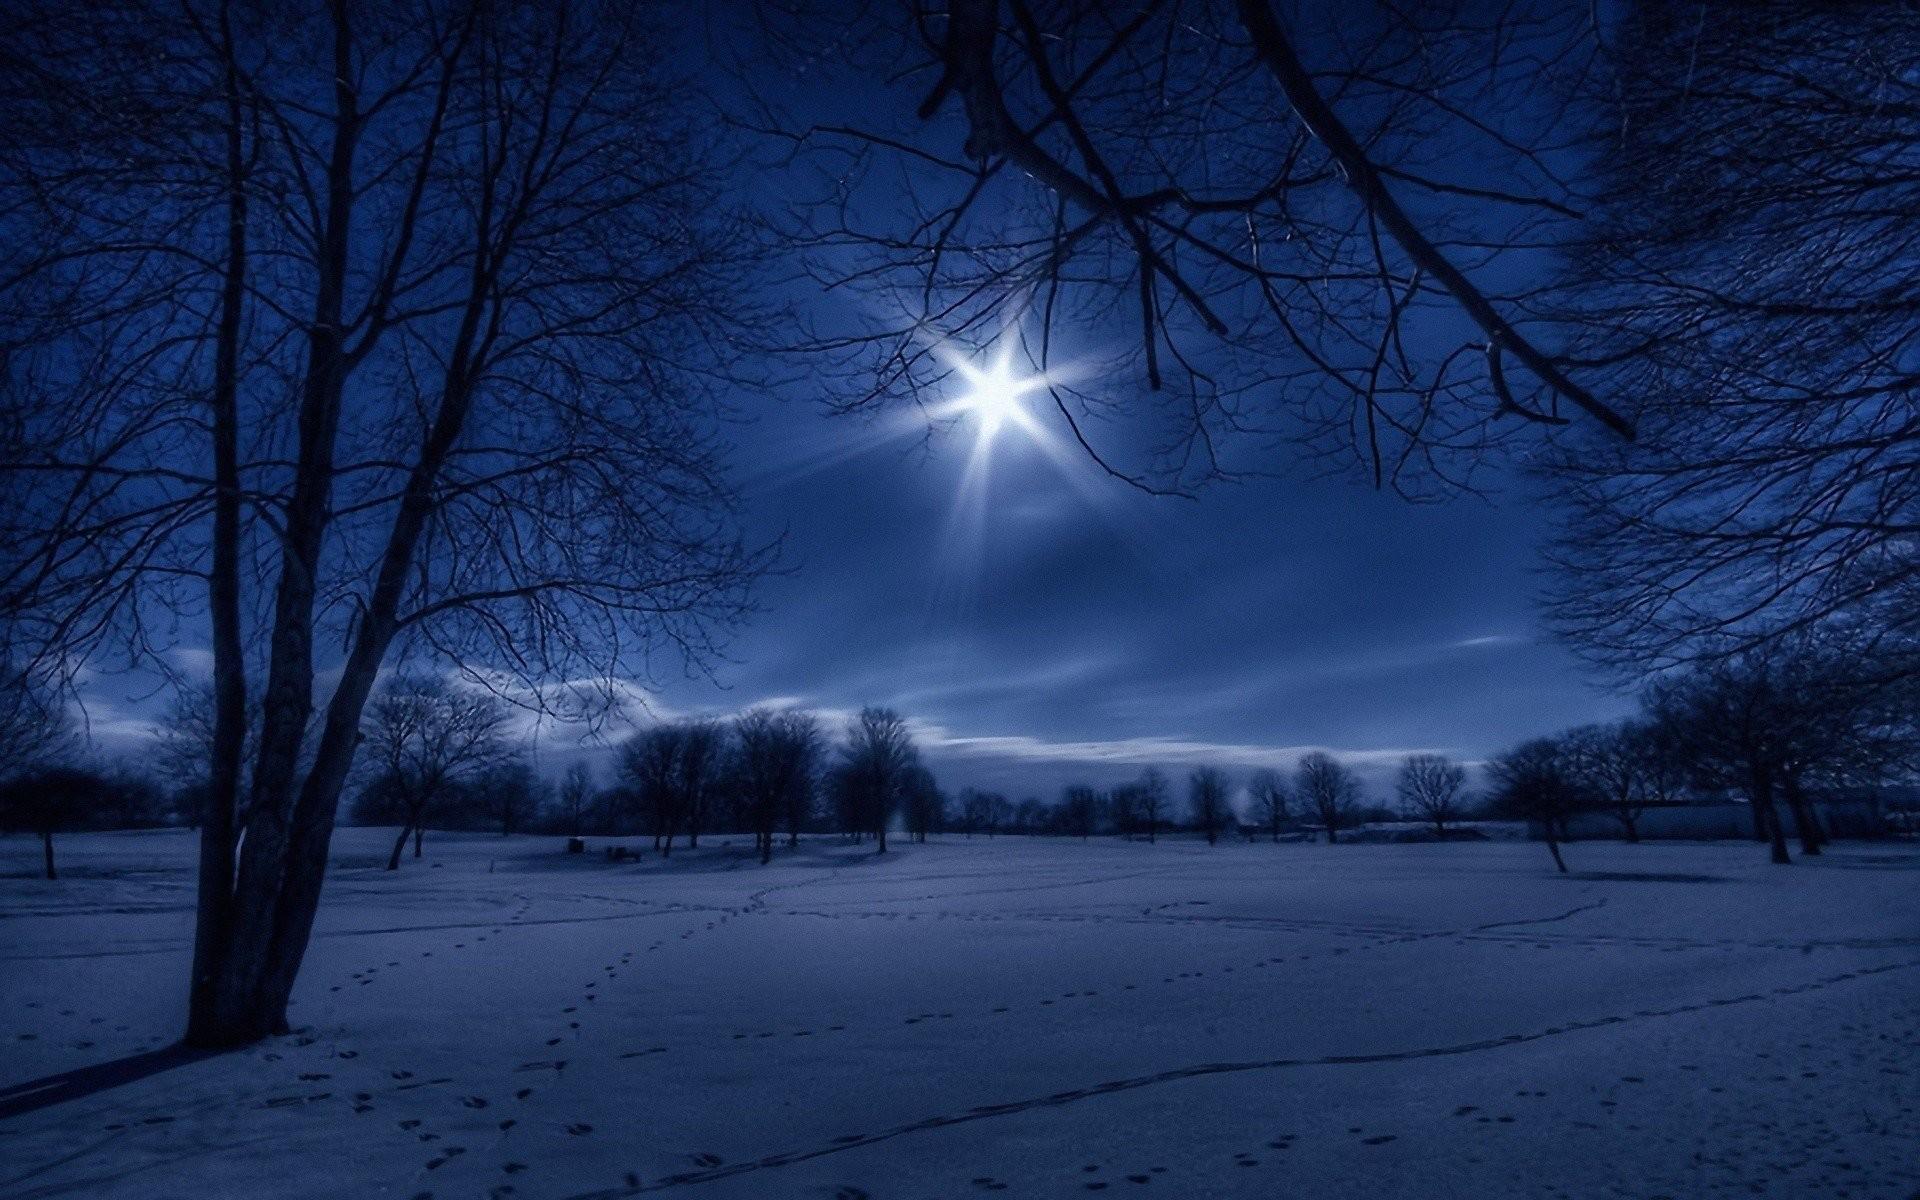 Winter Night In Moonlight Wallpaper Widescreen.